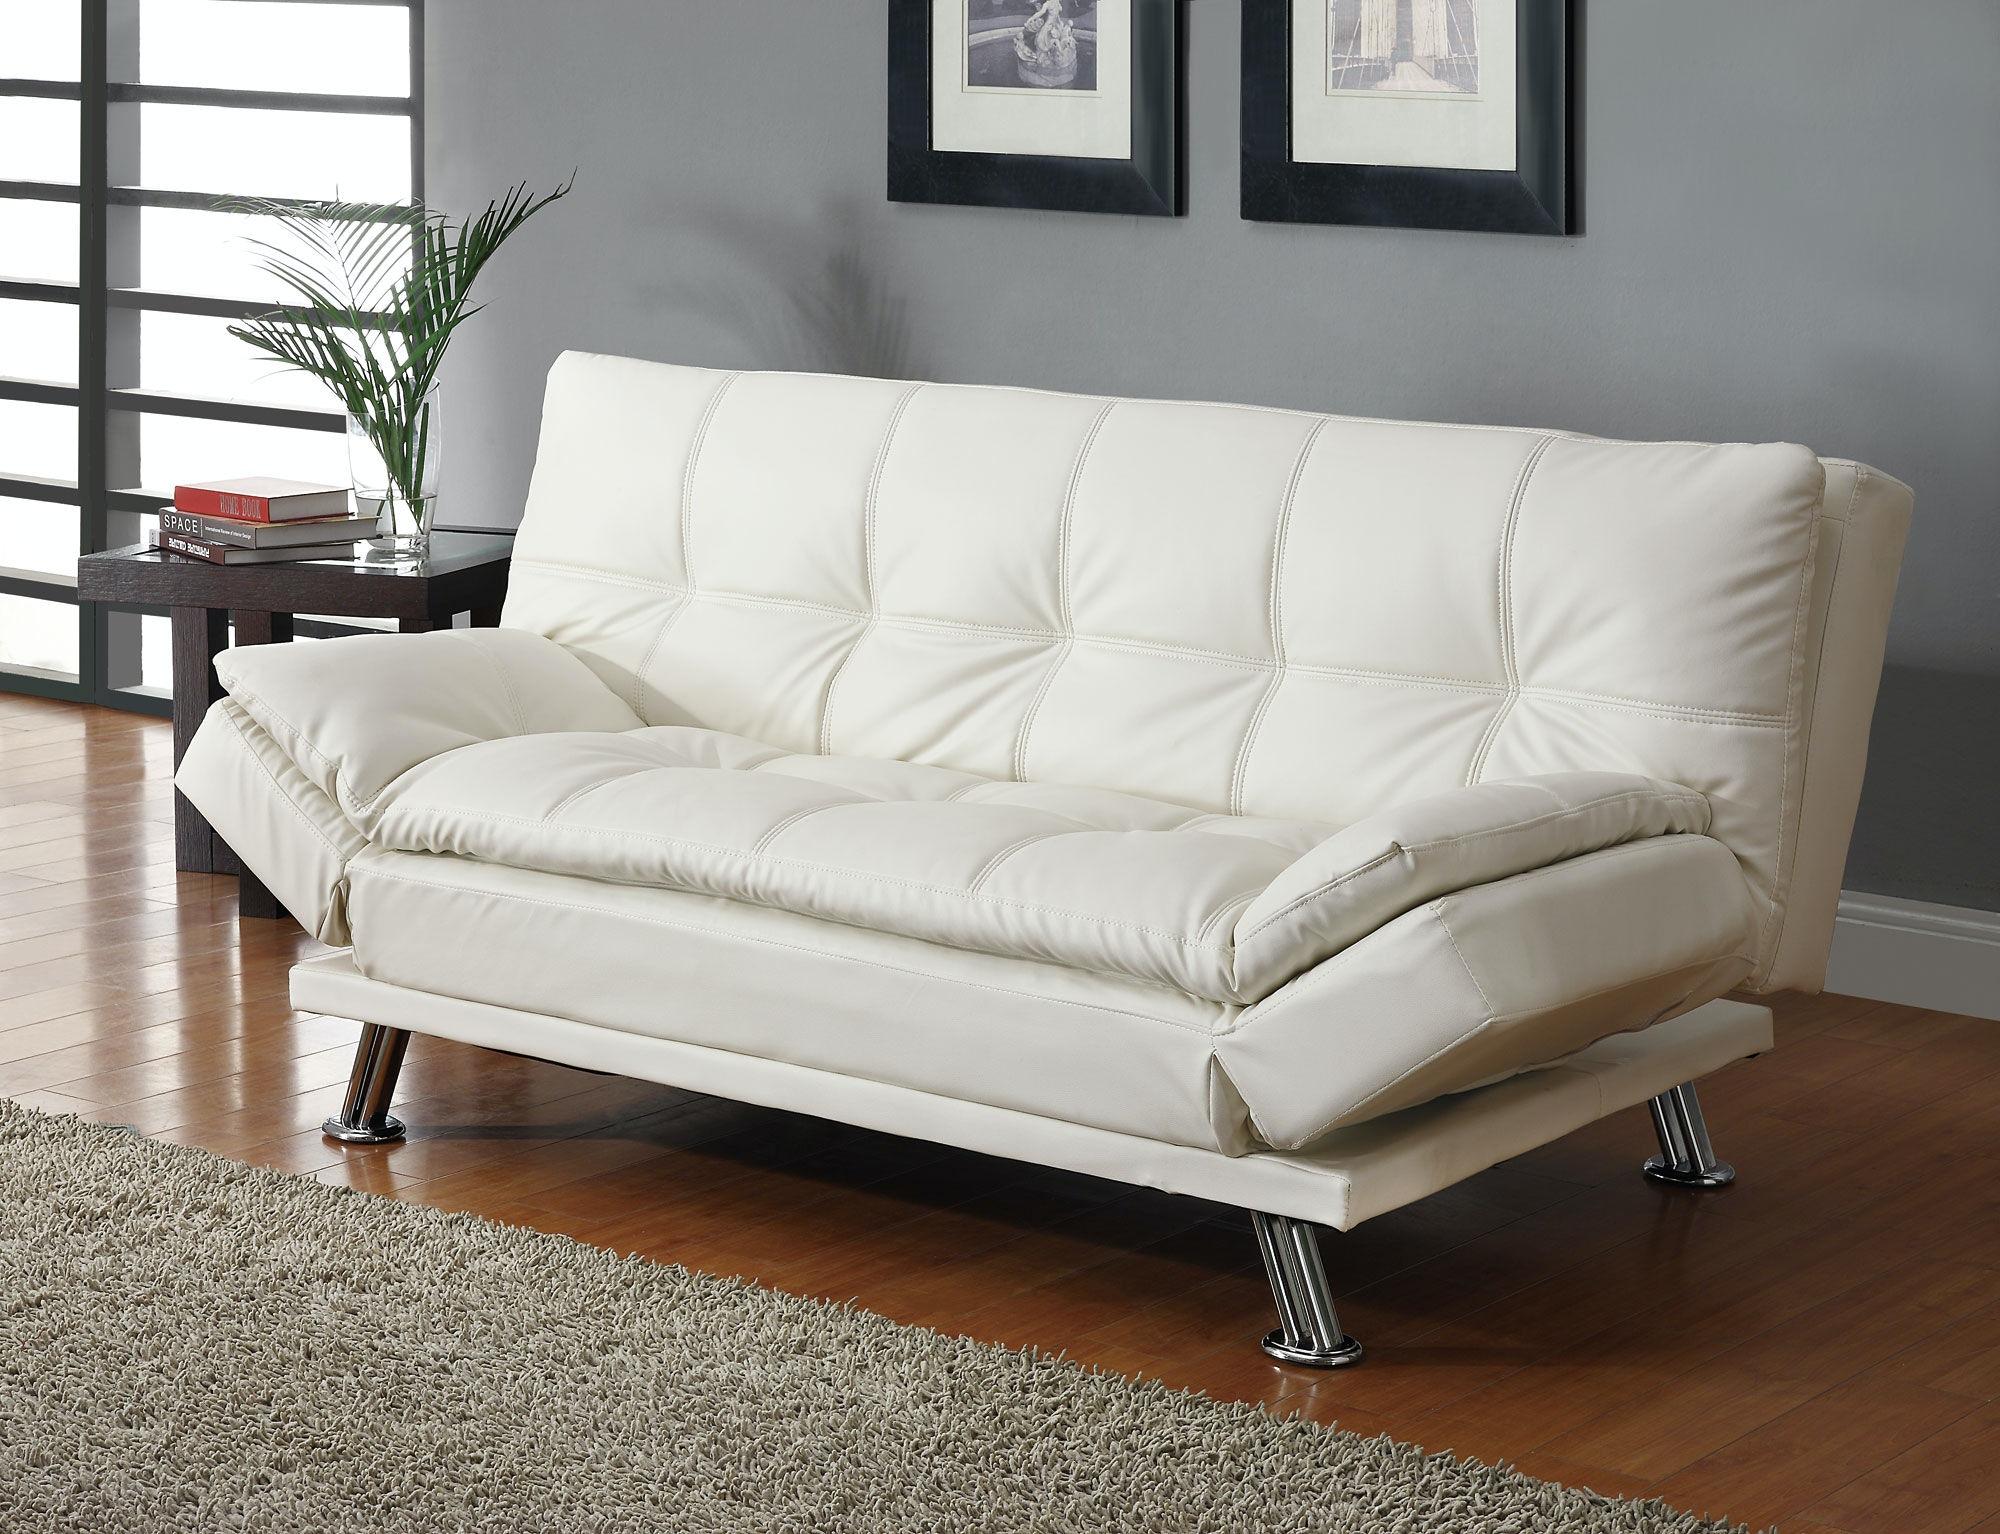 Living Room Furniture North Carolina coaster living room sofa bed 300291 - carolina furniture concepts